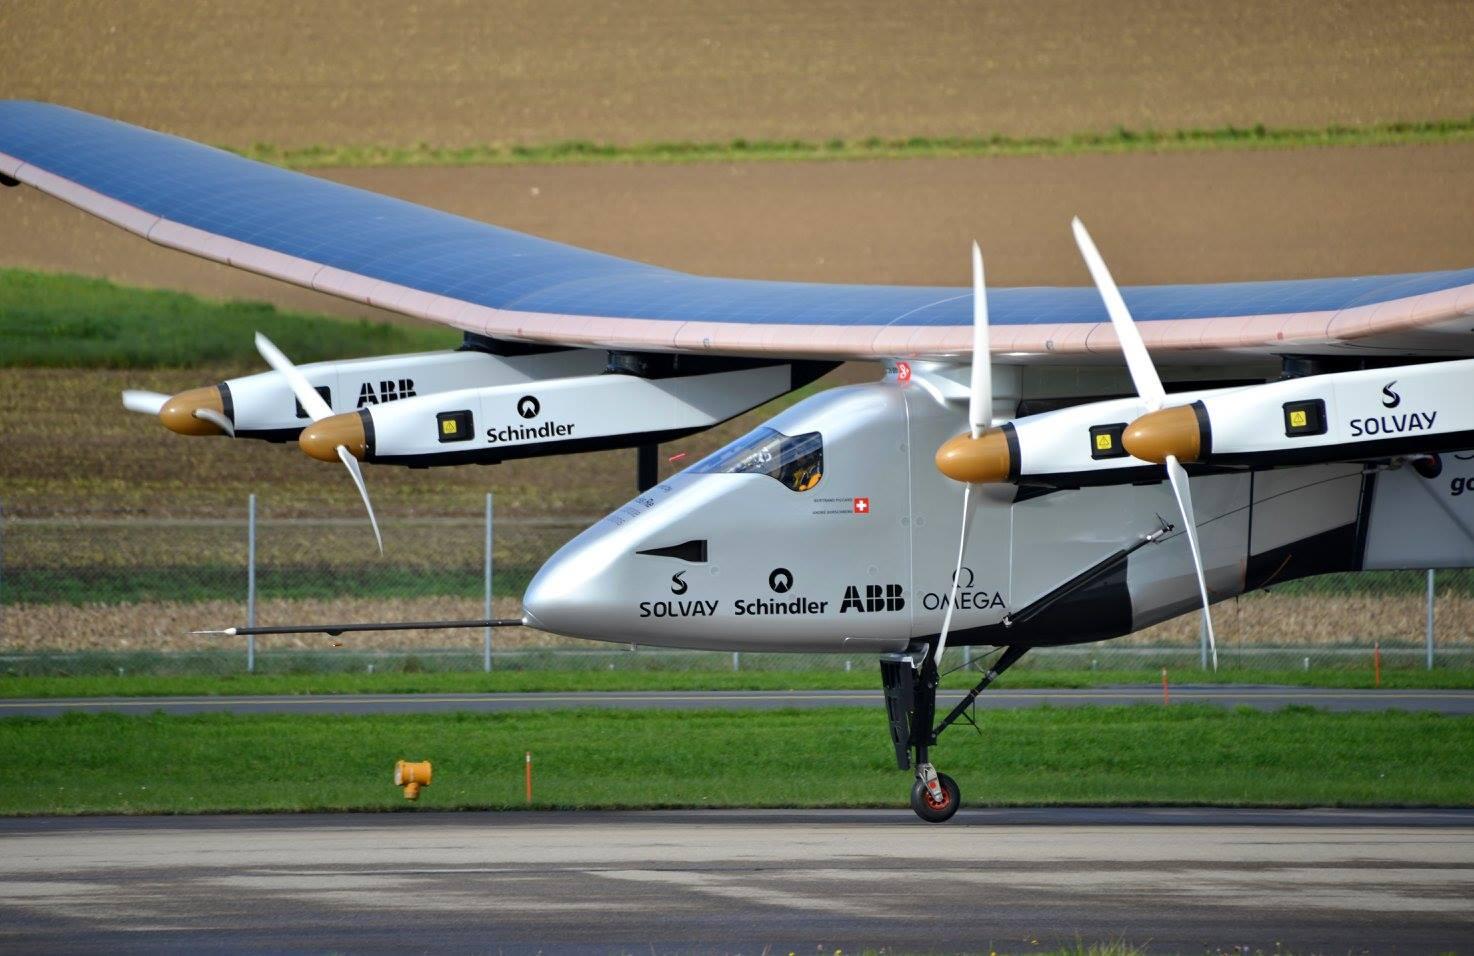 Solar Powered Plane Impulse